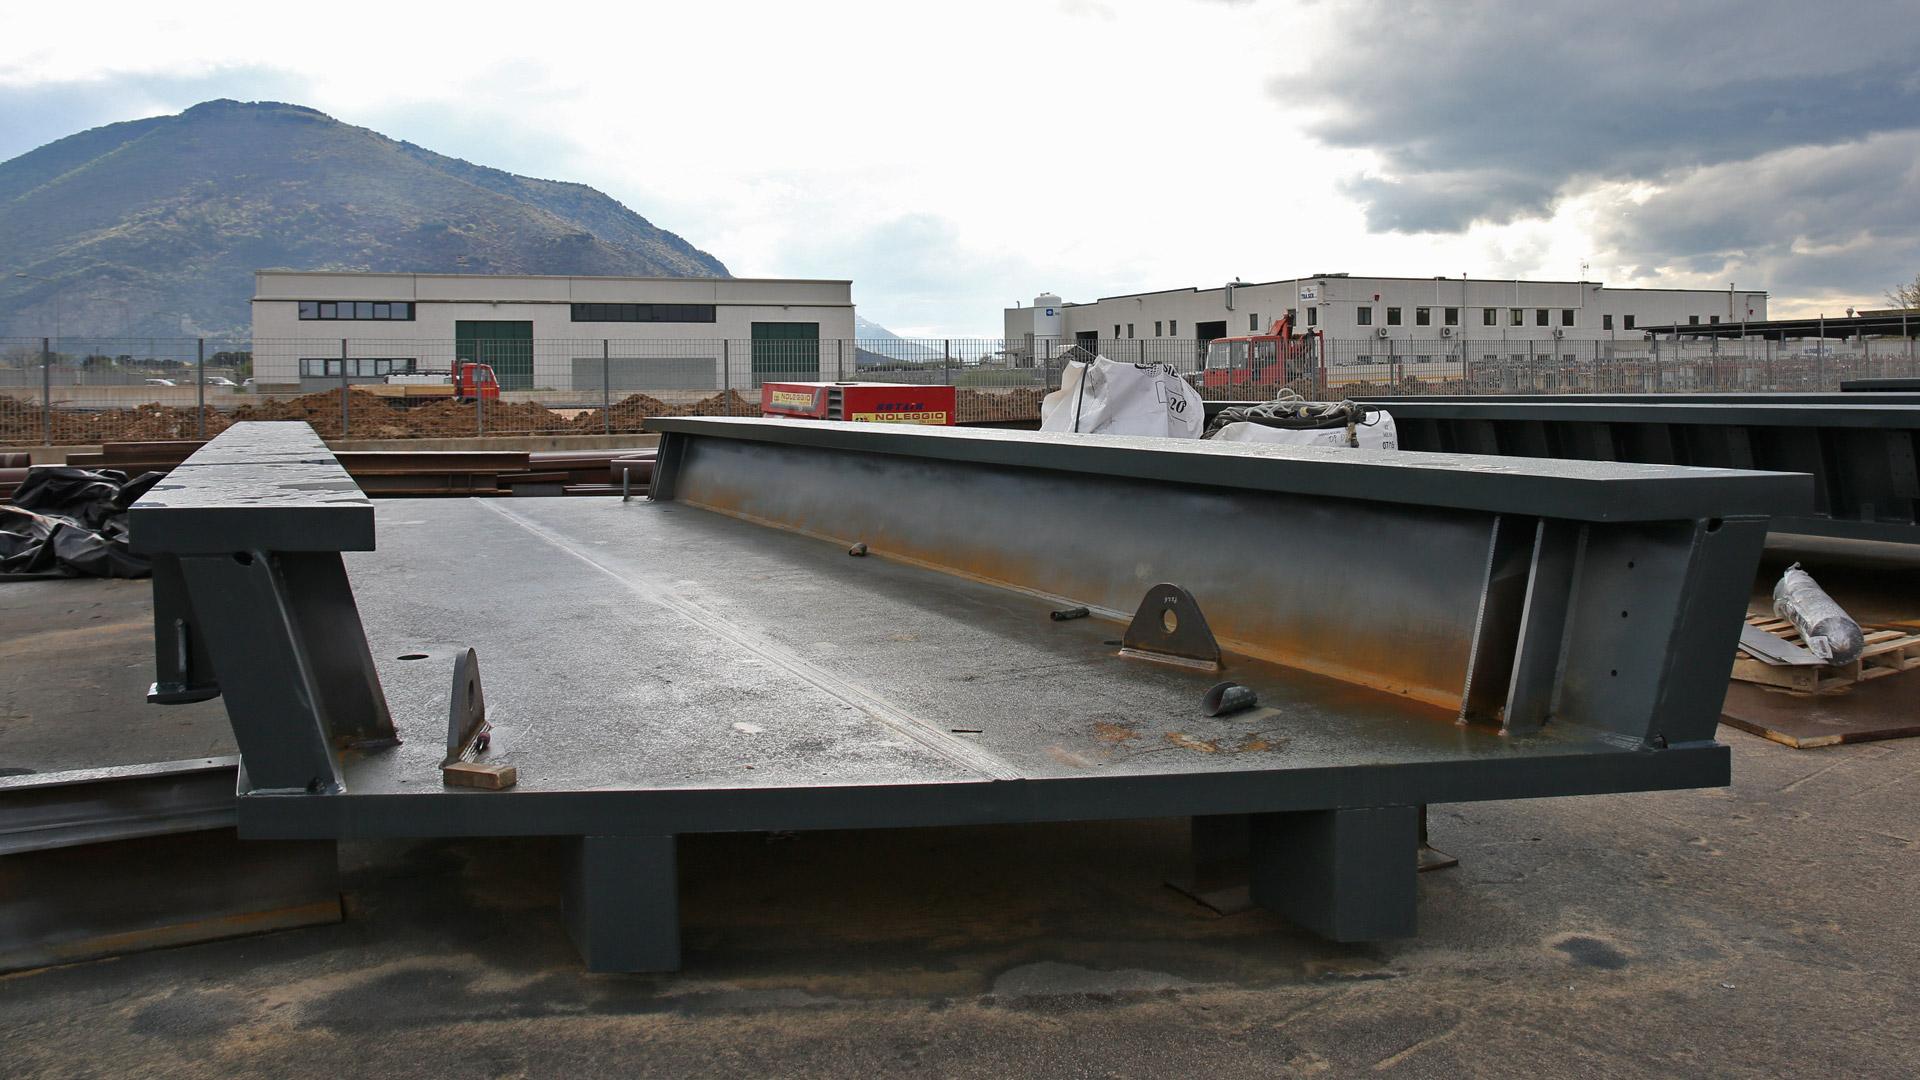 ponte-ferroviario-san-bonifacio-sezione-metal-engineering-carpenteria-metallica-civile